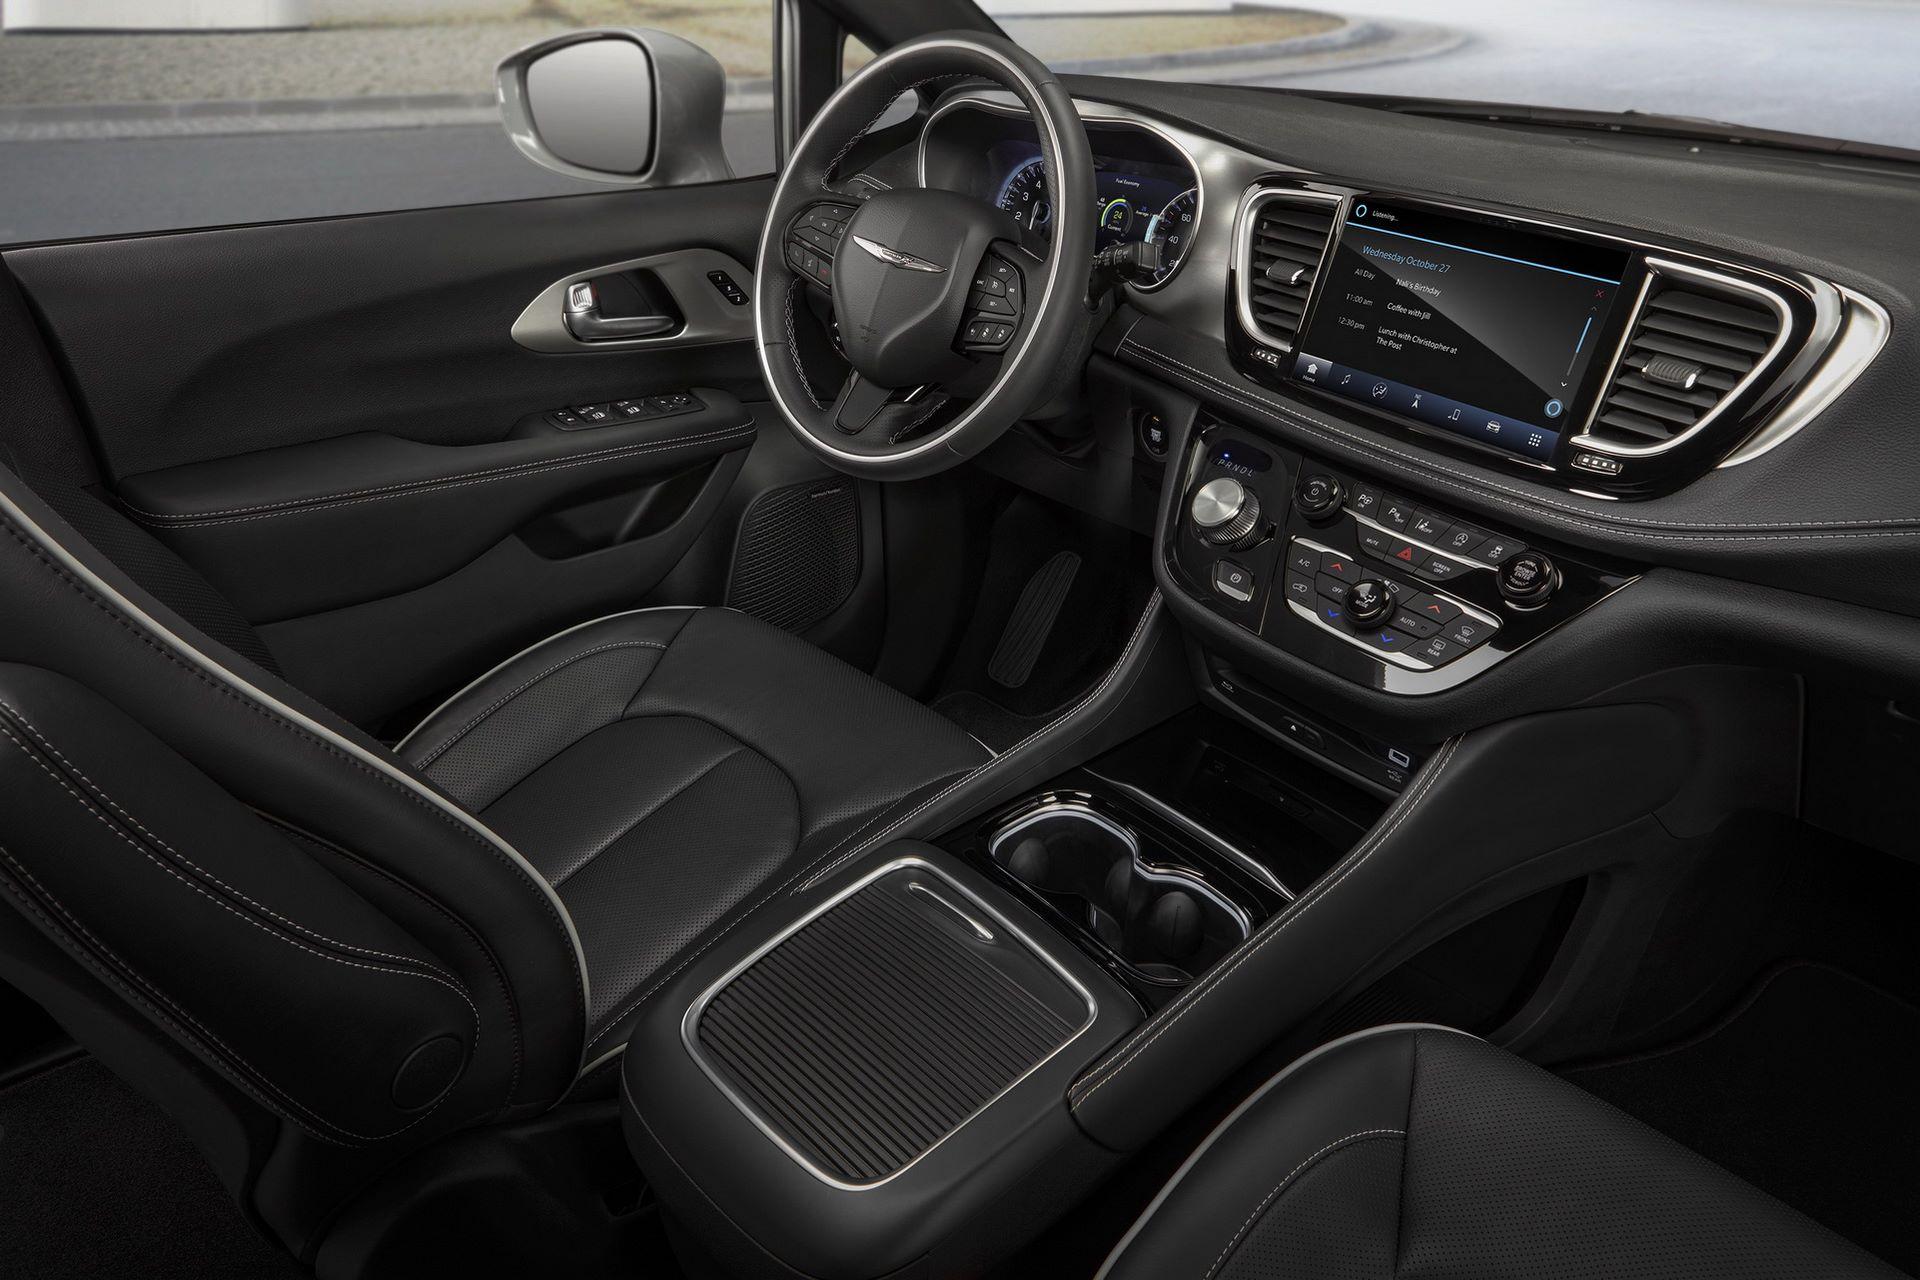 2021-Chrysler-Pacifica-147